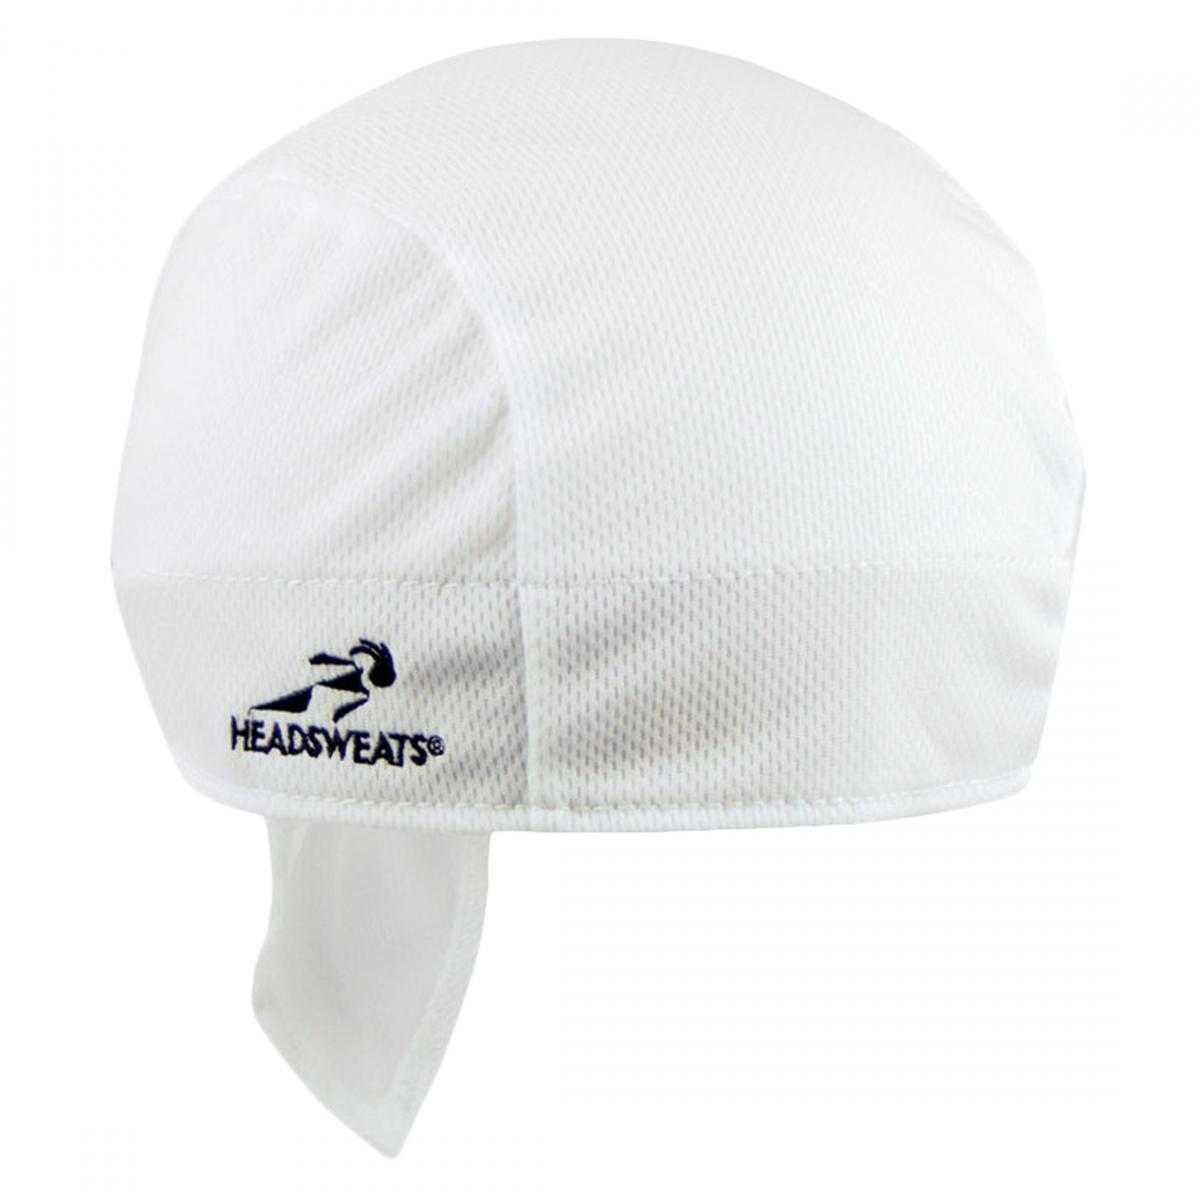 Headsweats Shorty Coolmax Clothing Bandana H//s Shorty Coolmax Royal Bl 14